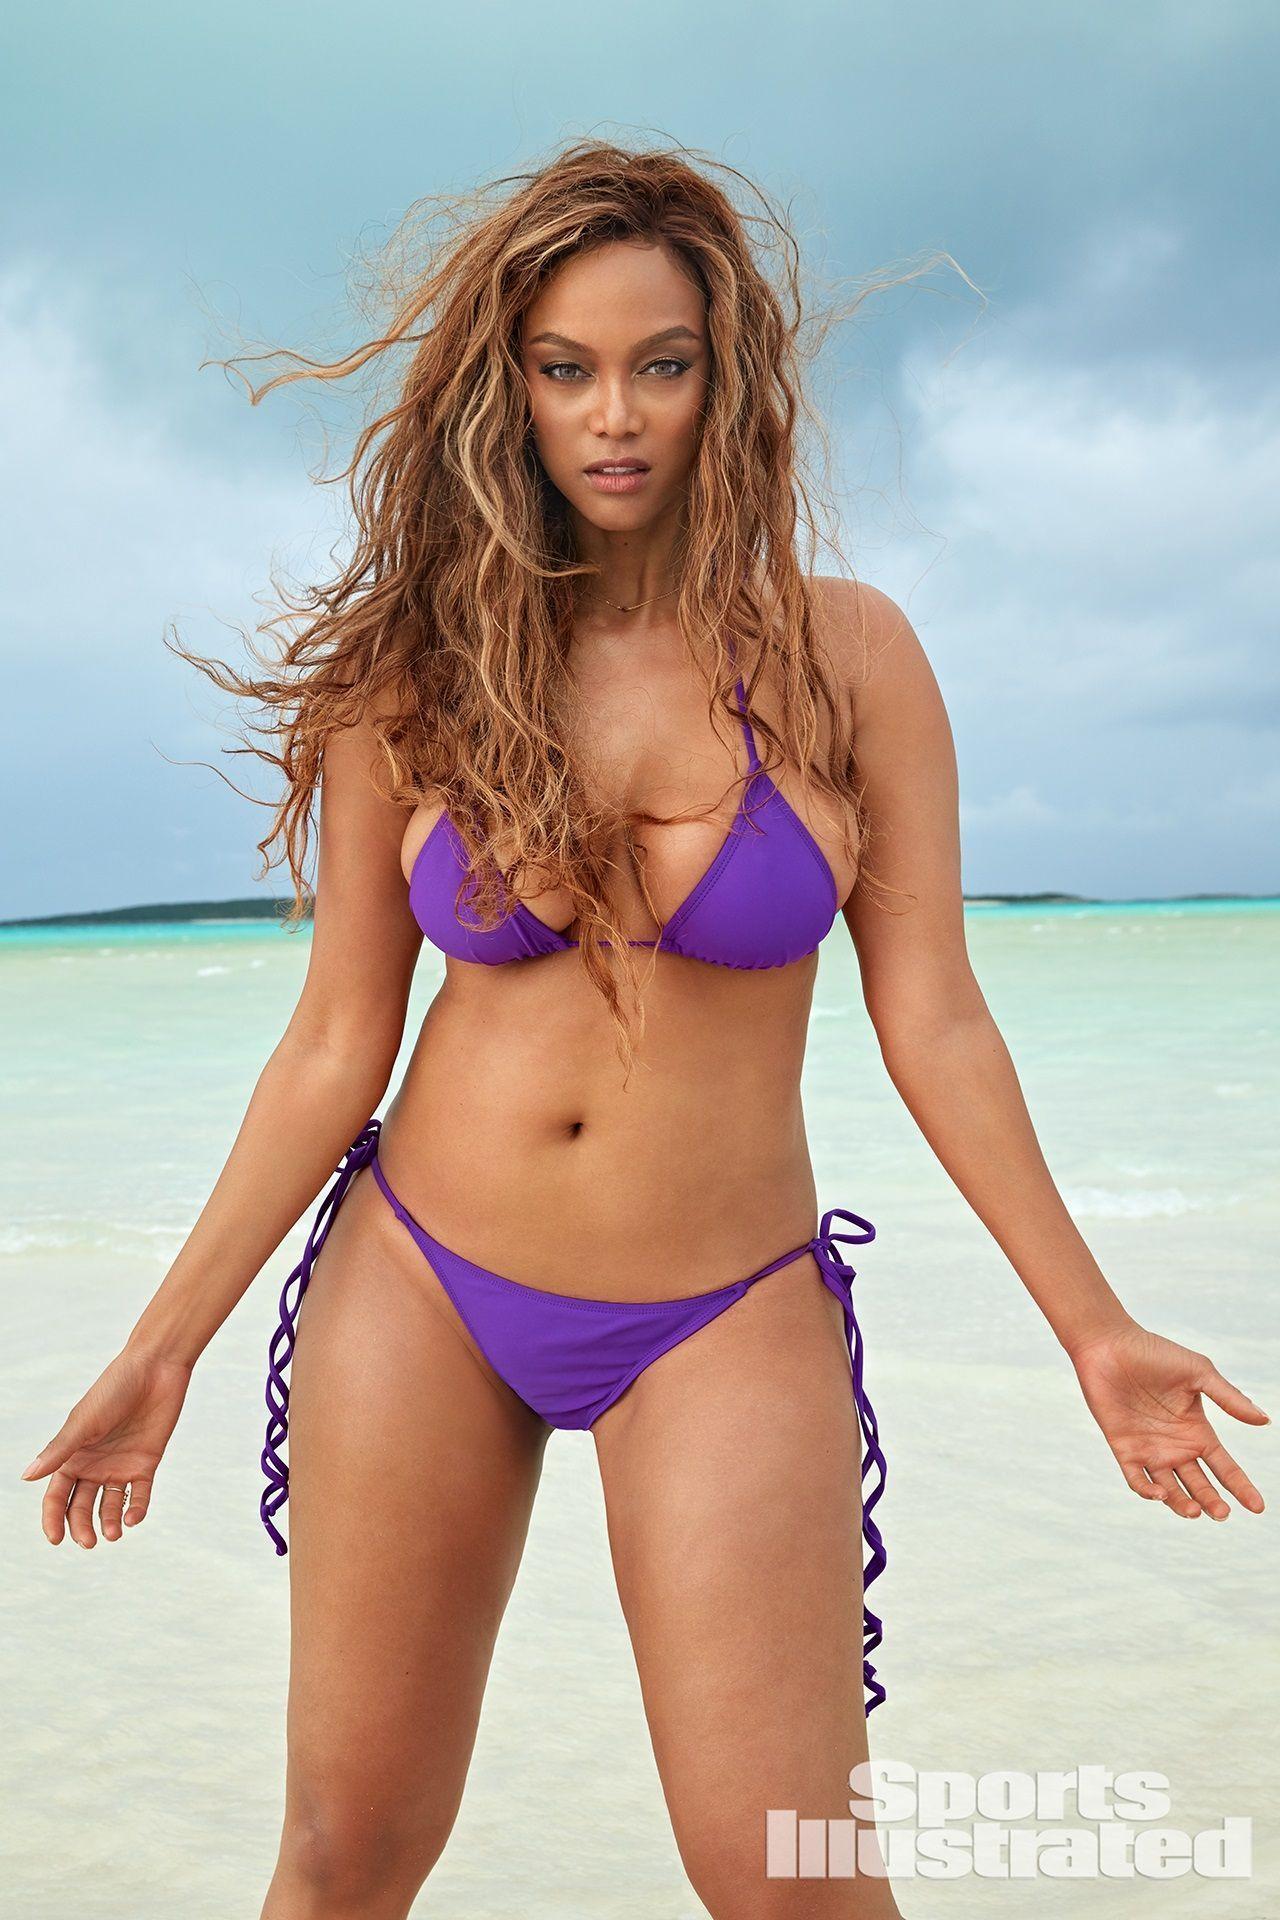 Tyra Banks Sports Illustrated Swimsuit 2019 Bikini Photoshoot Swimwear Sports Illustrated Swimsuit